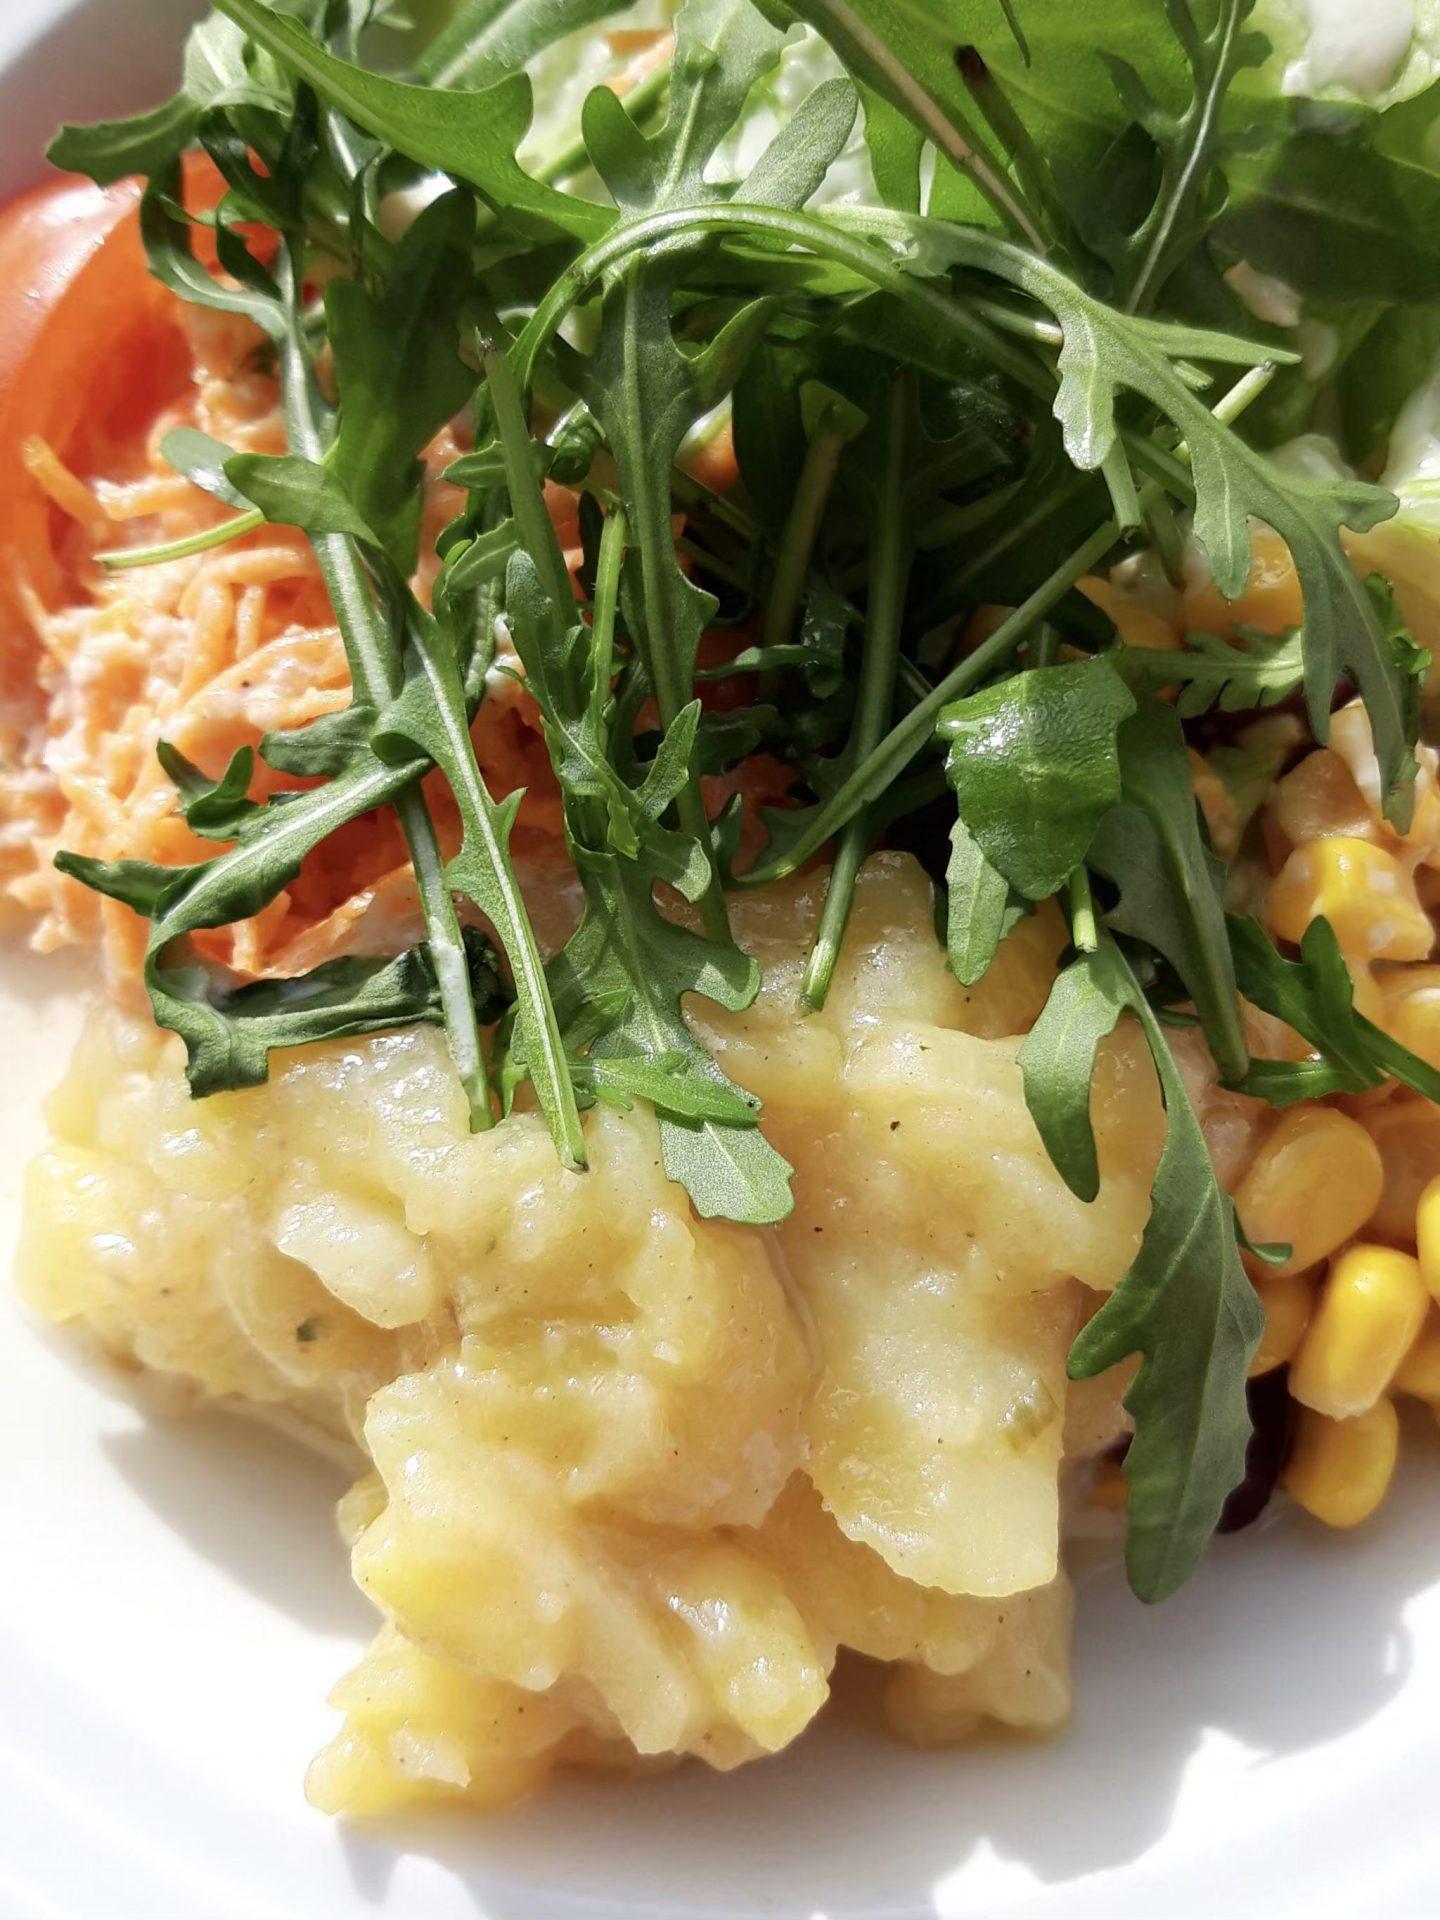 Salat Wurmegg Hochleger Skijuwel Alpbachtal Wildschönau Salatäquator Foodblog Sternestulle